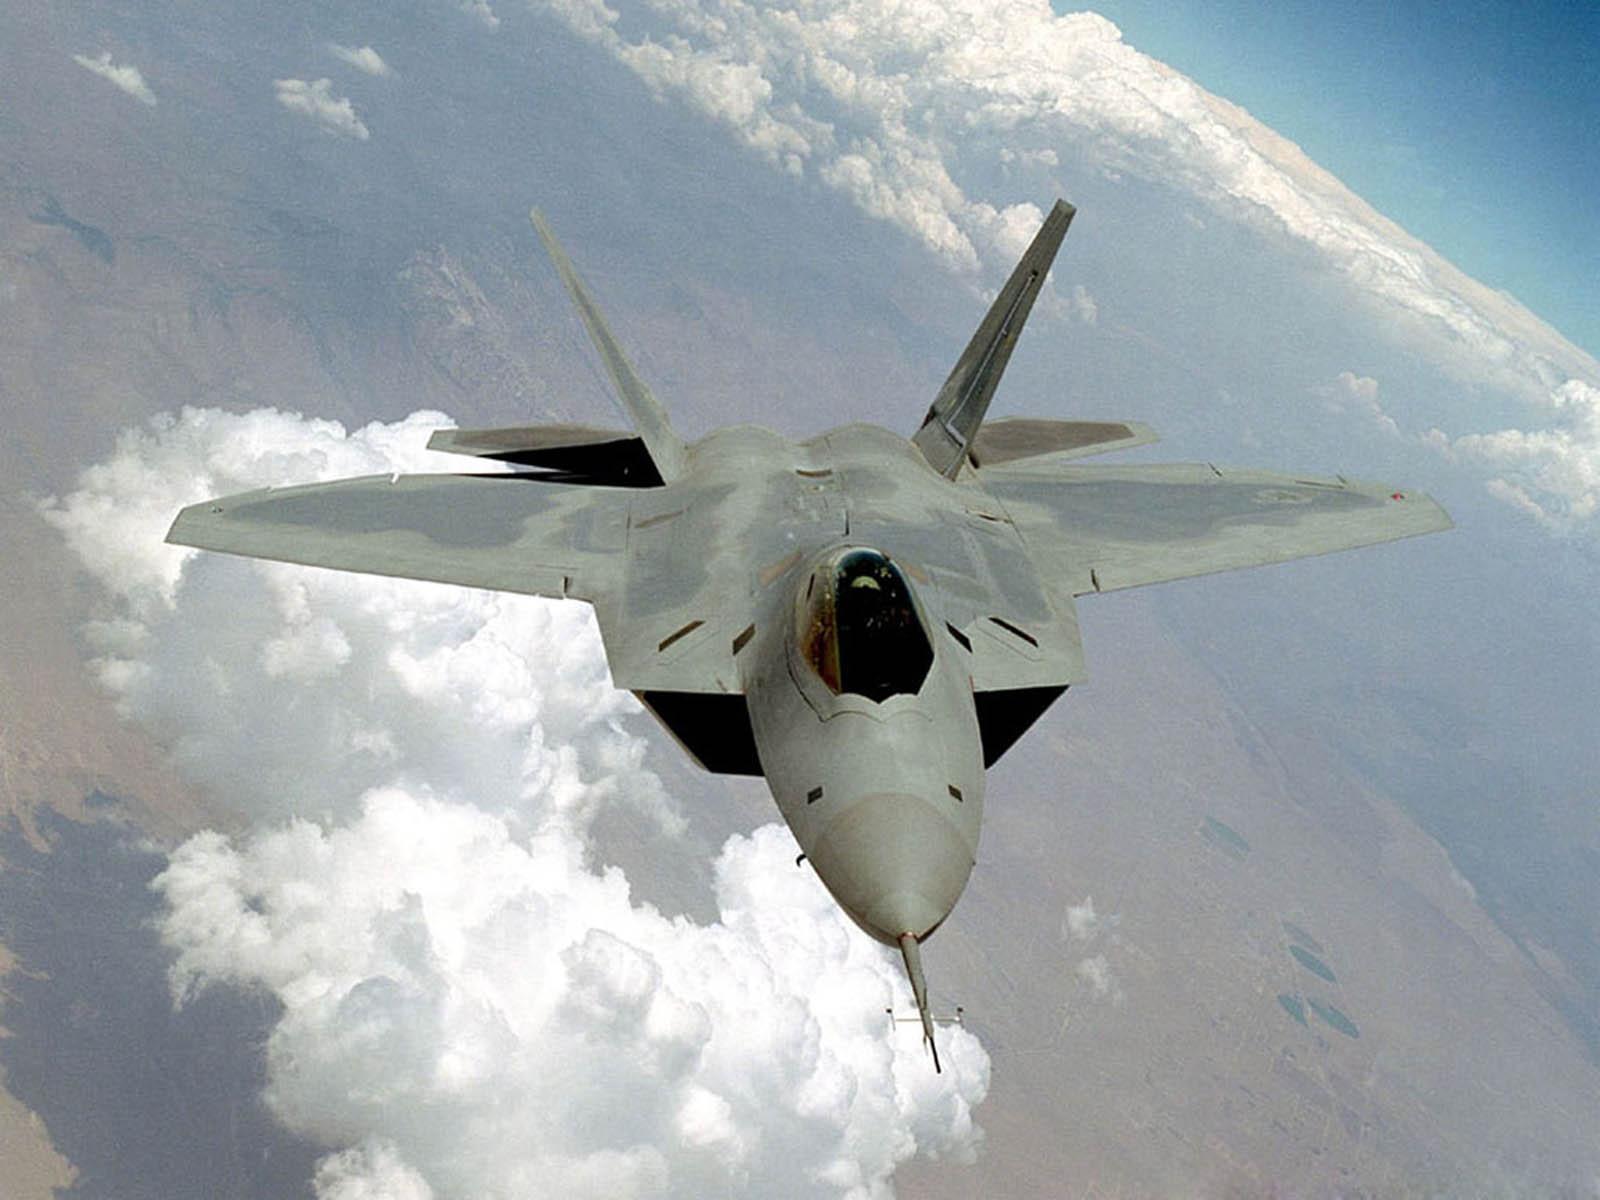 Wallpapers f 22 raptor military jet fighter wallpapers - Jet wallpaper ...